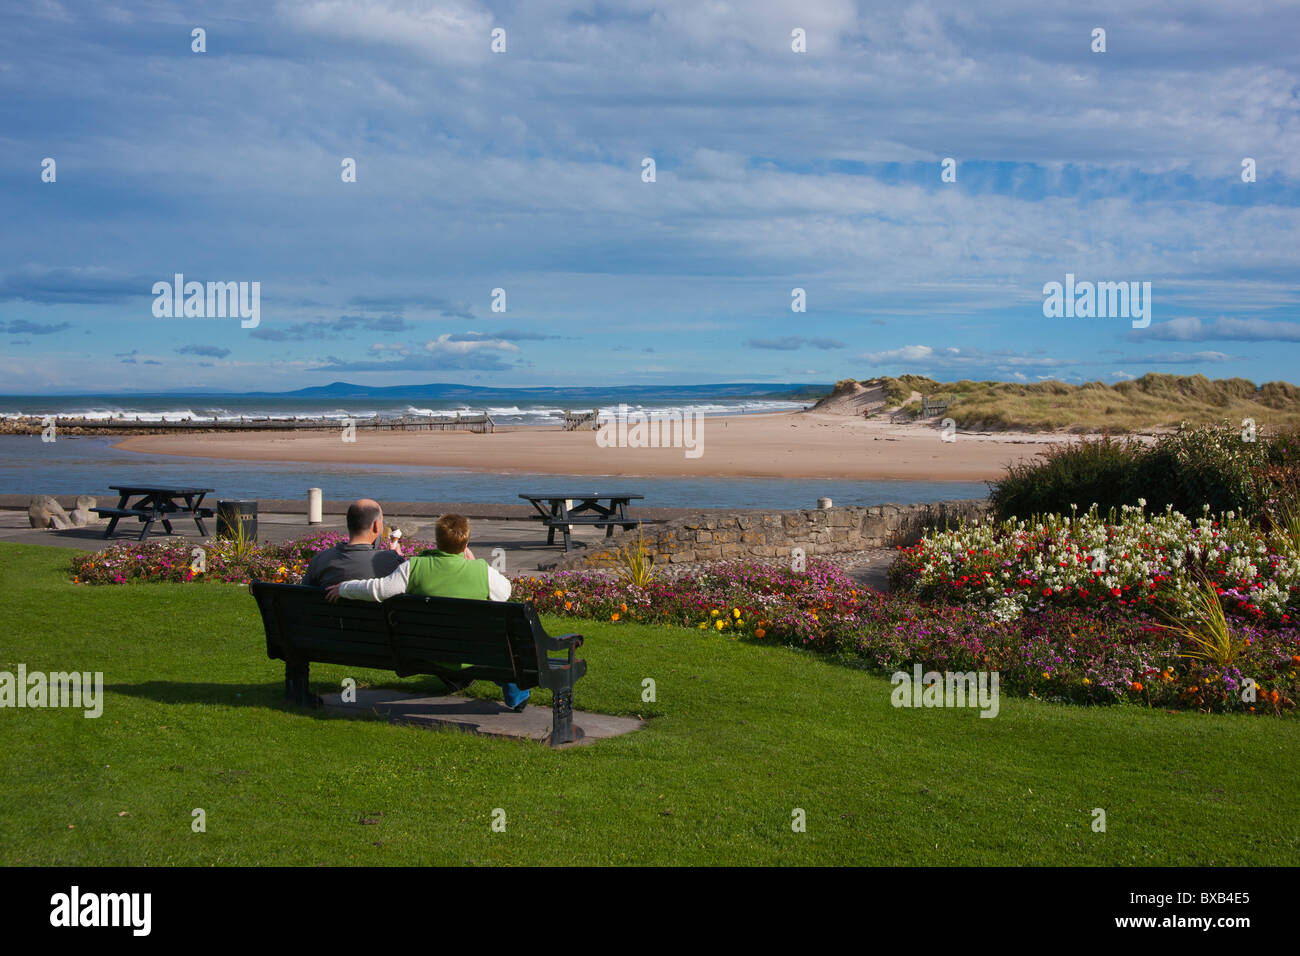 Lossiemouth, Highland Region, Scotland, September, 2010 - Stock Image